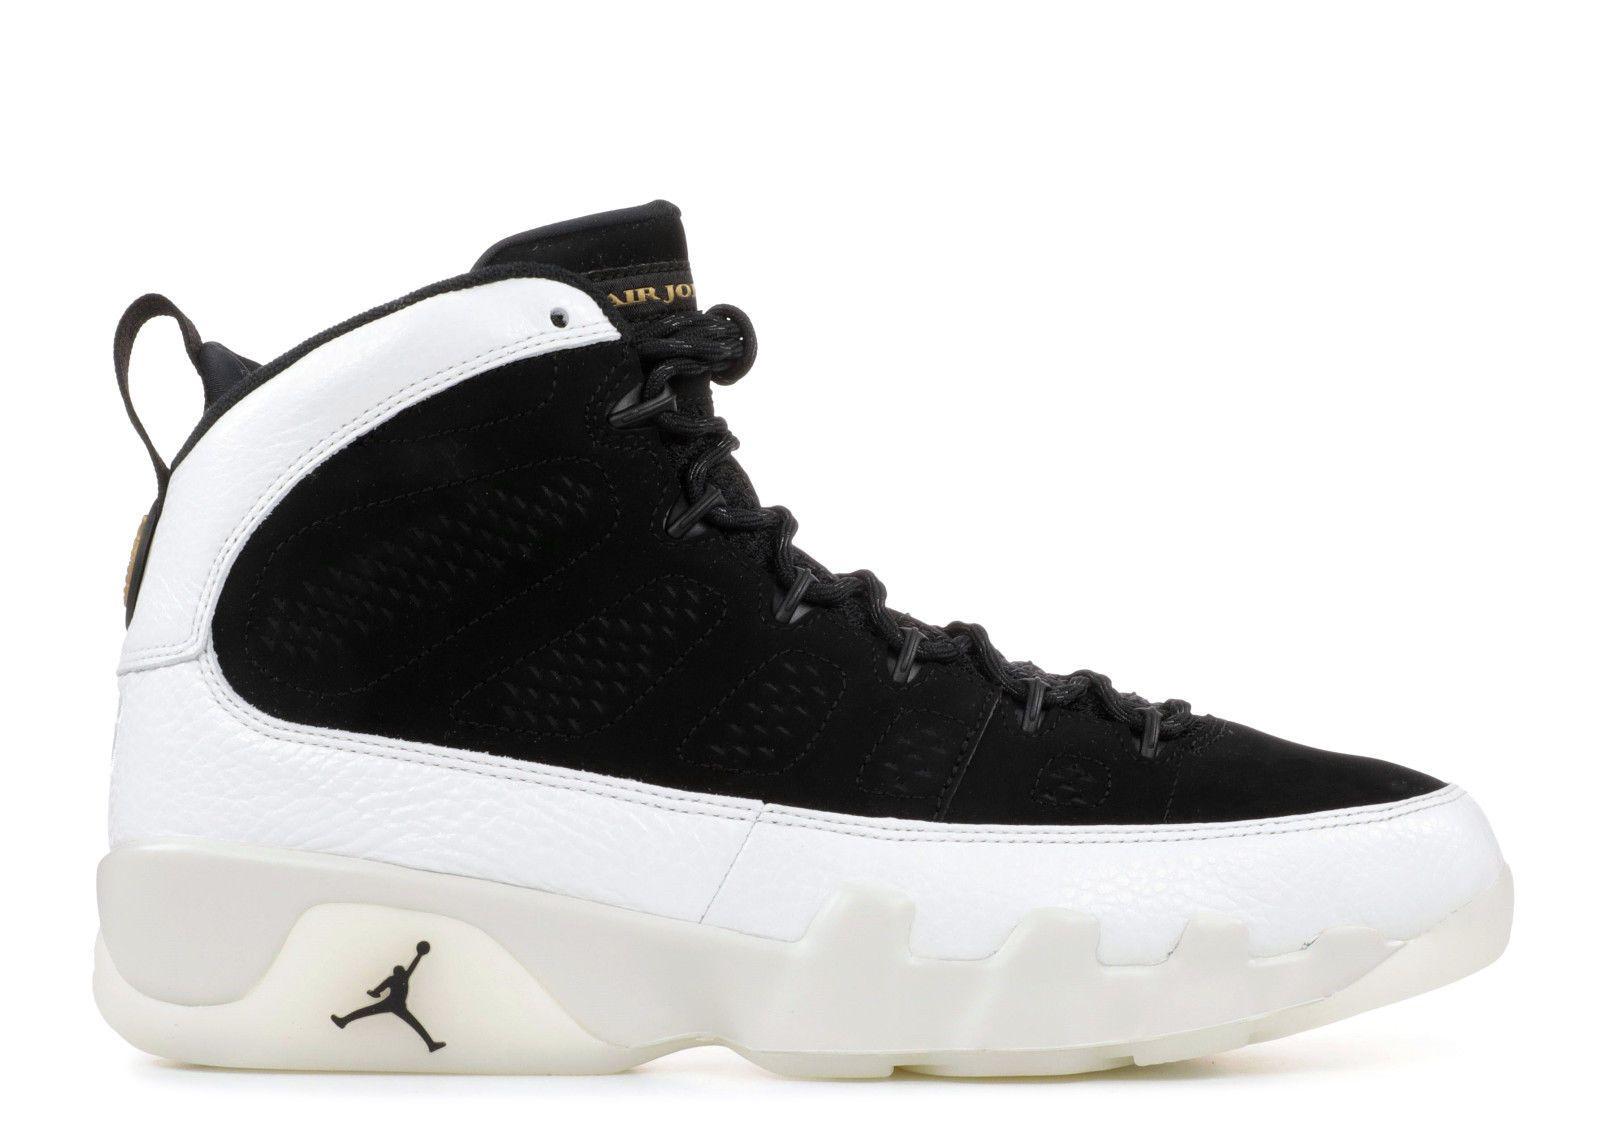 2018 Air Jordan certificate IX On sale White/Black 302370 021